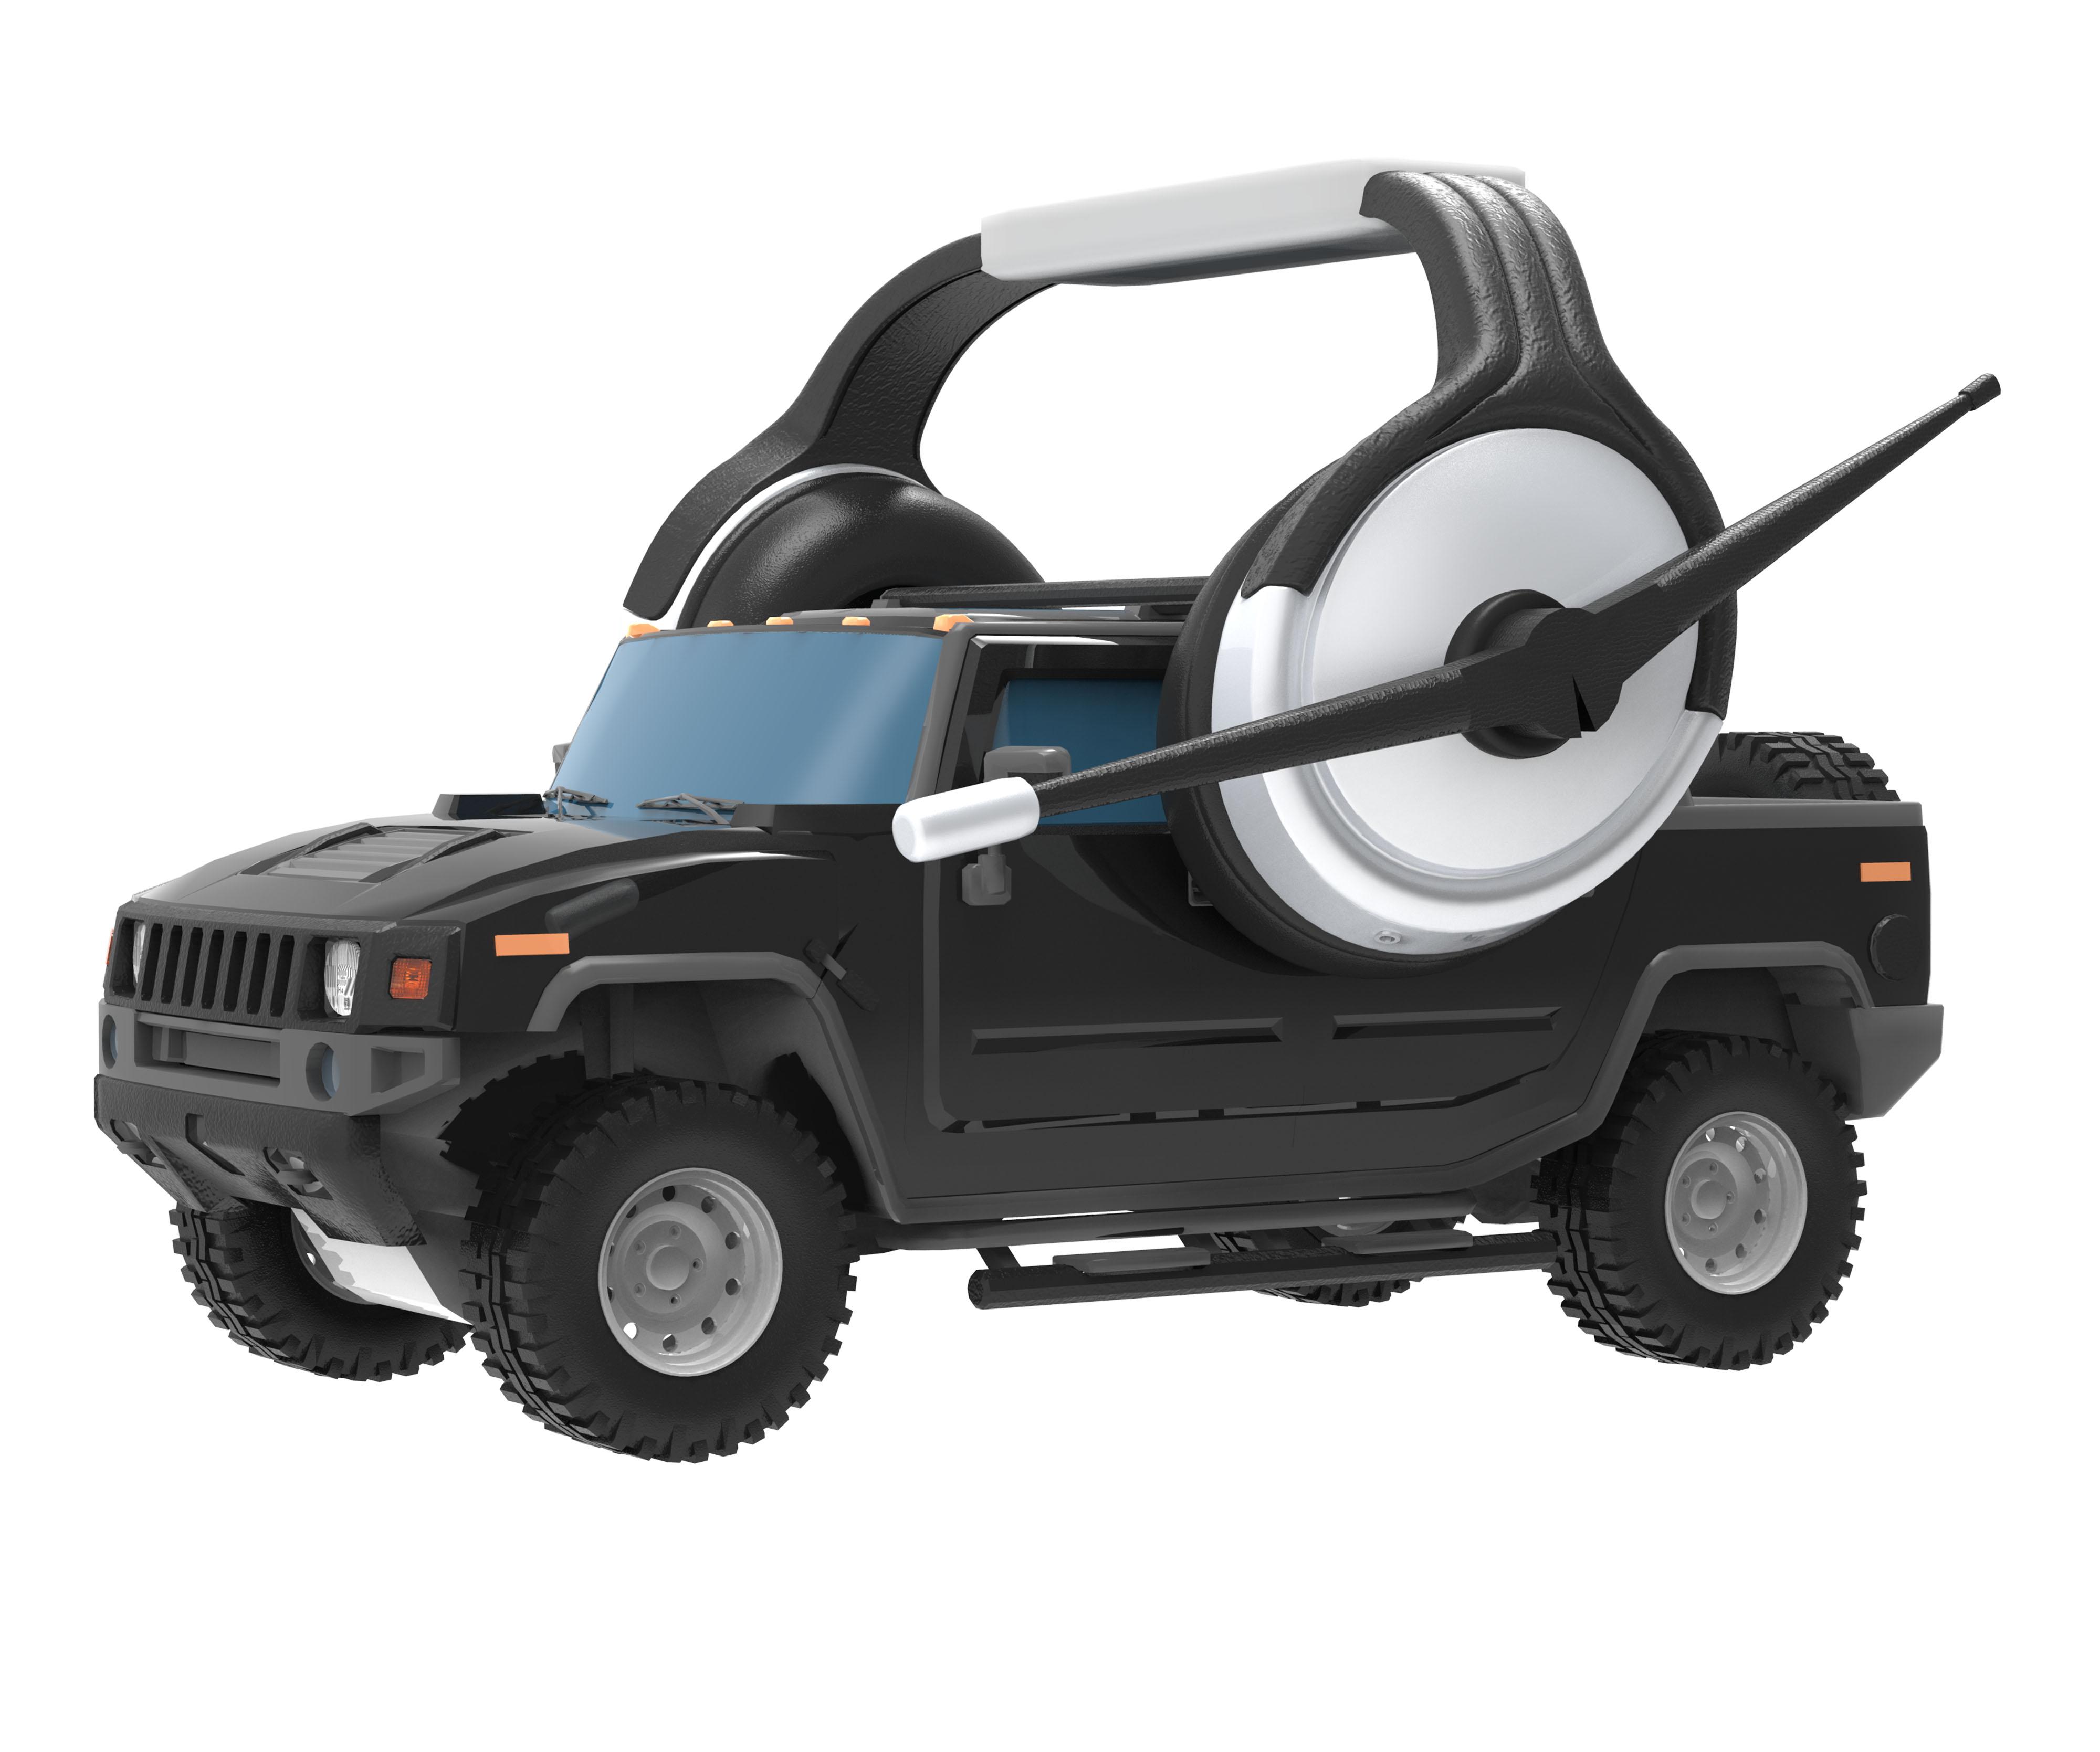 Black jeep isolated photo